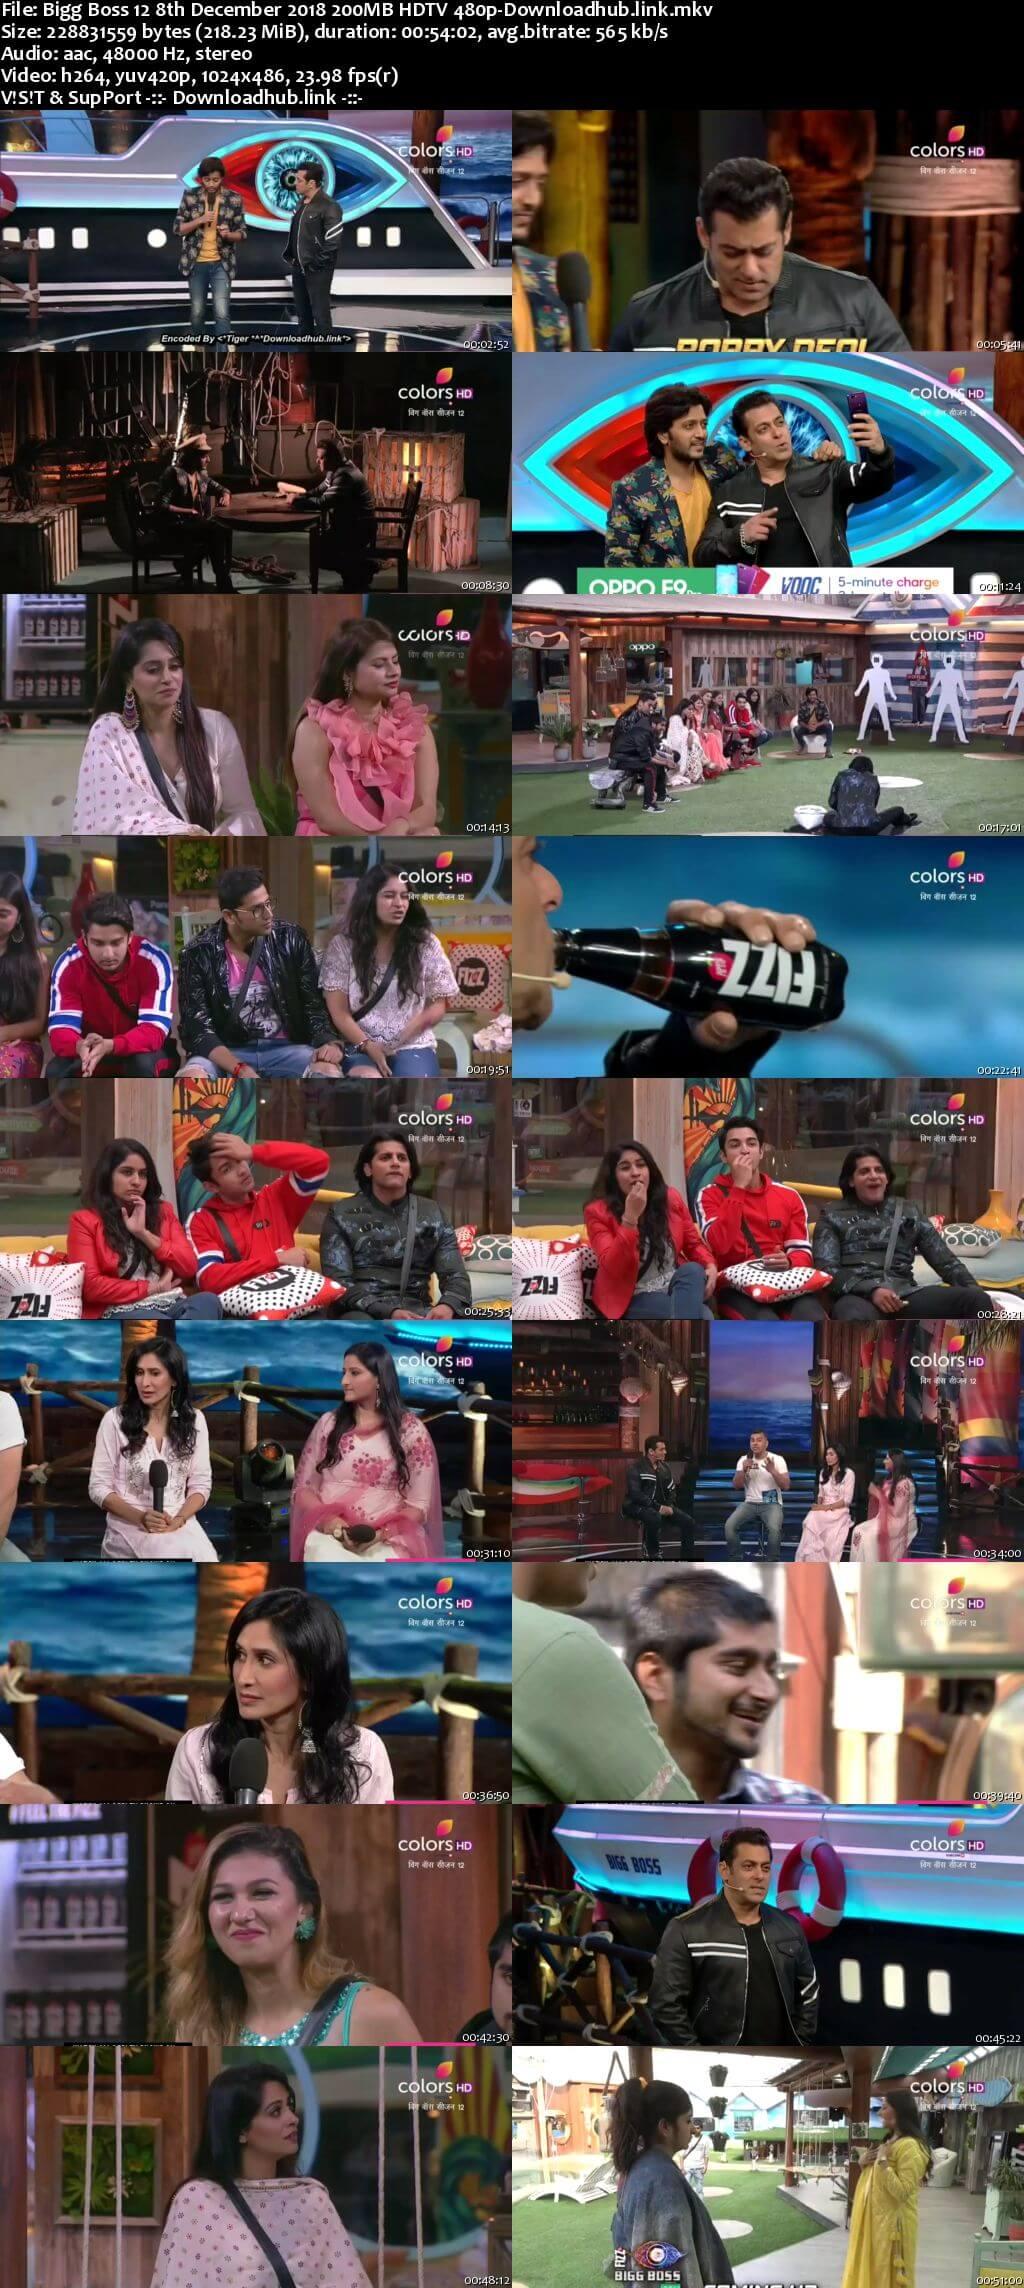 Bigg Boss 12 08 December 2018 Episode 83 HDTV 480p